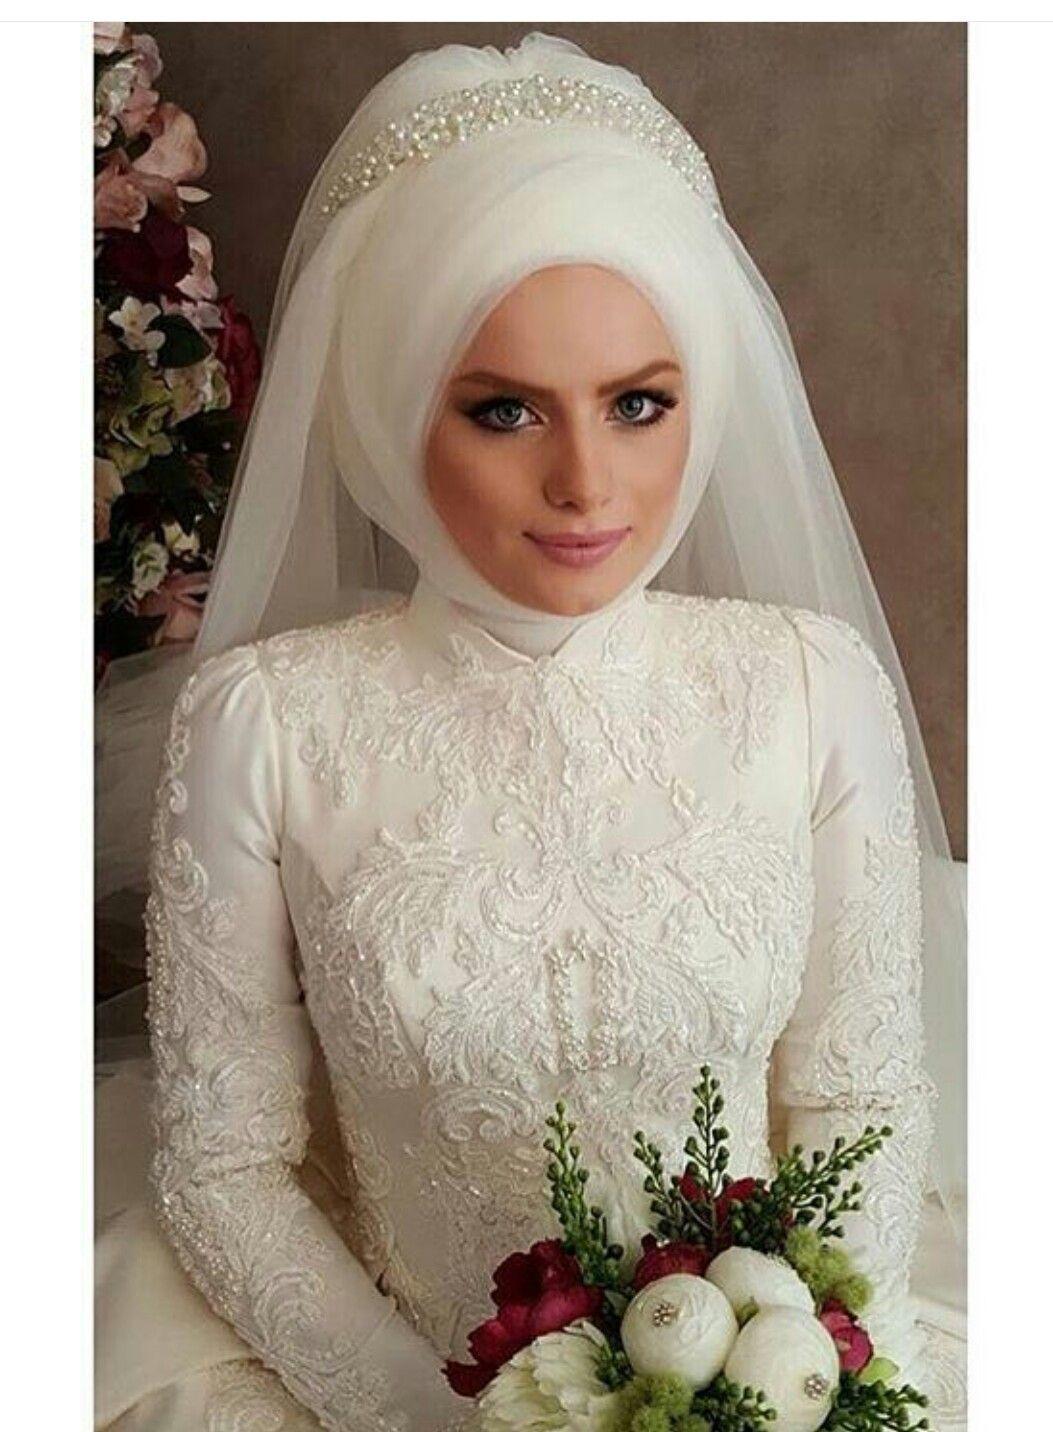 Pin by Gözde arslan on Wedding | Pinterest | Wedding dress, Wedding ...